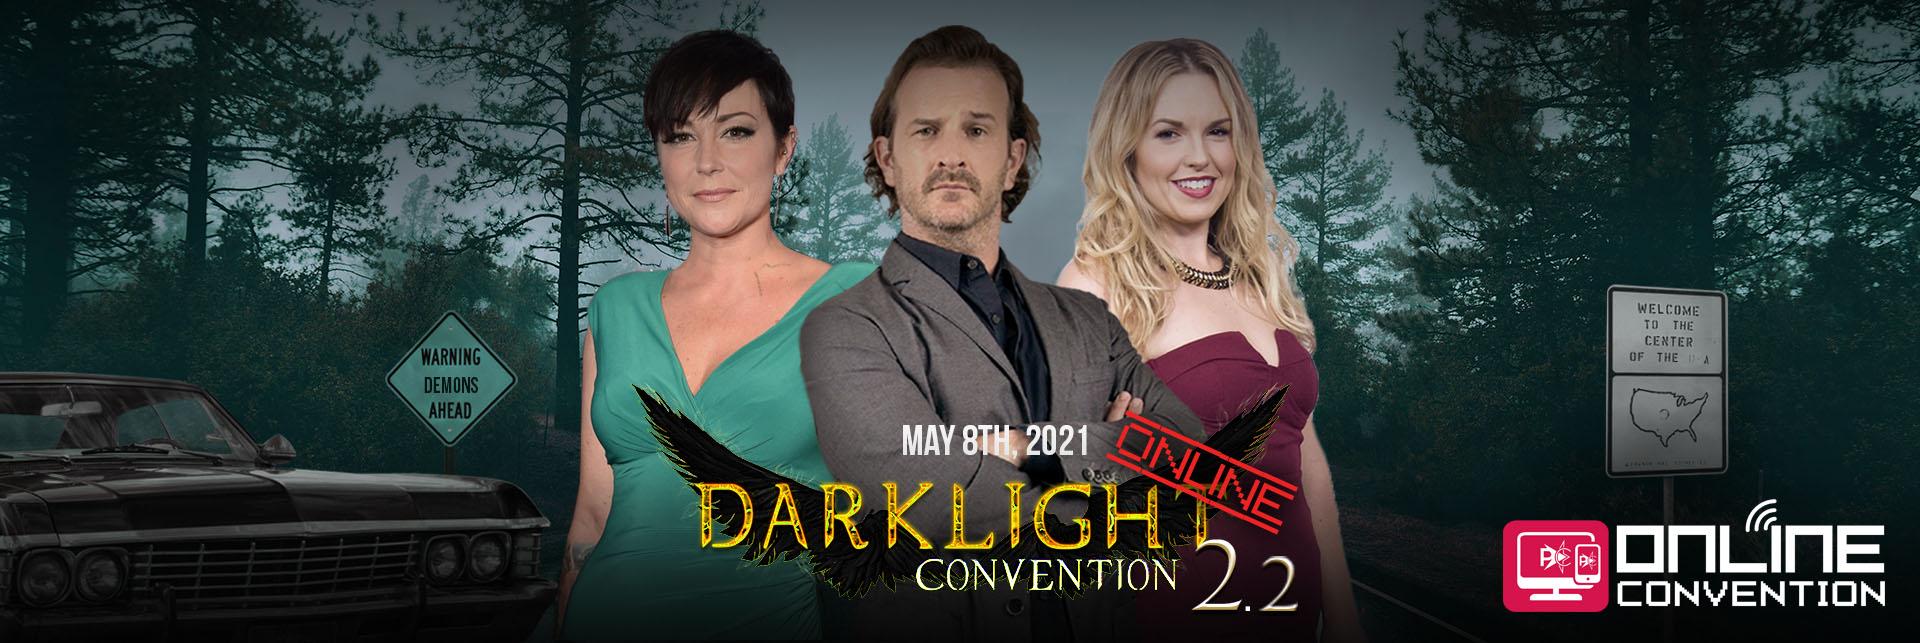 DarkLight Con Online 2.2 de People Convention : date et invité·e·s !